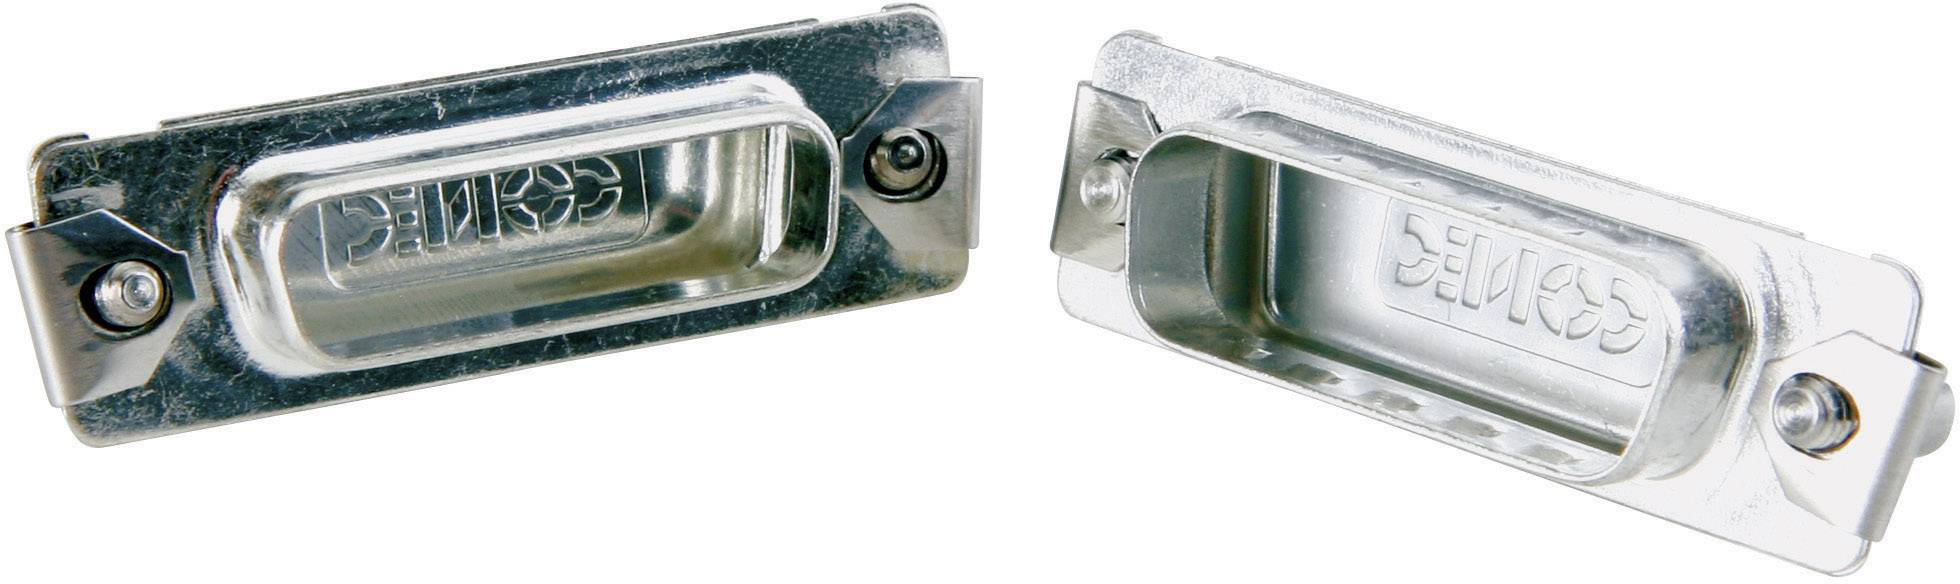 Záslepka D-SUB konektoru Conec 165X16749X pro 37pólovou D-SUB zásuvku, stříbrná, 1 ks